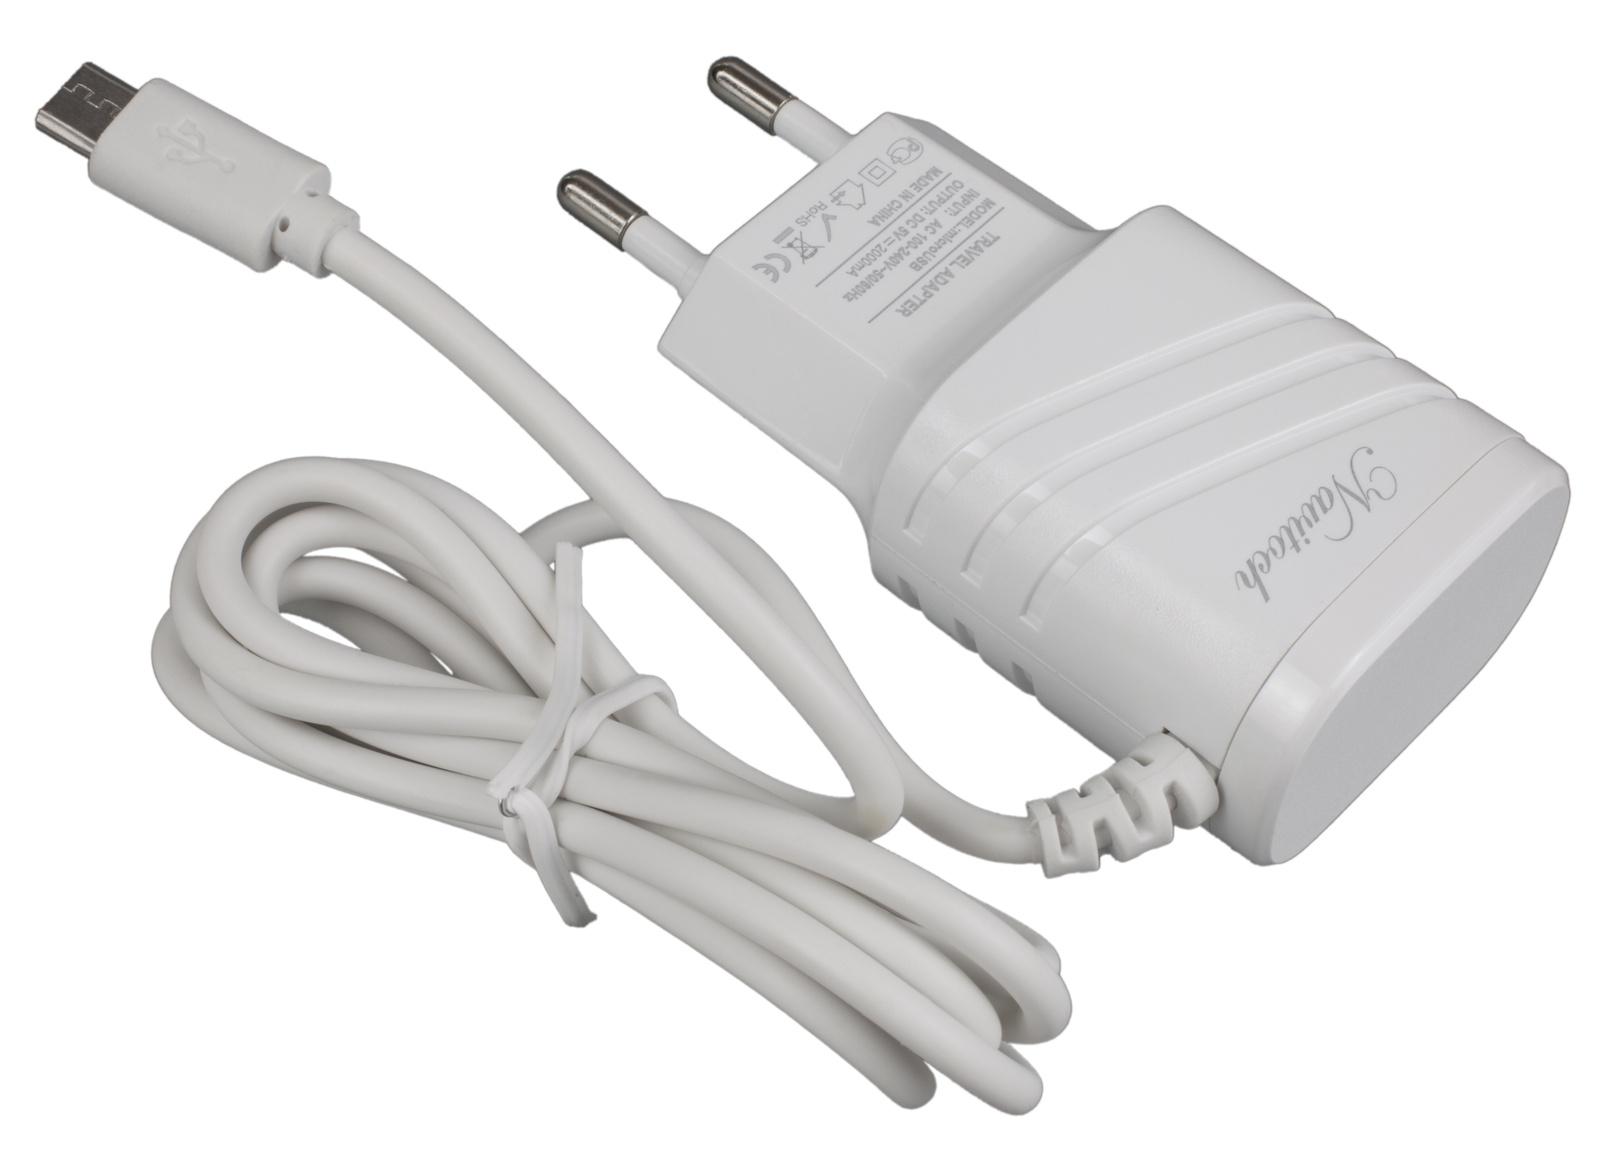 Фото - Зарядное устройство Navitoch microUSB 2A, 3826, белый беспроводное зарядное устройство microusb cellularline fast 160 см